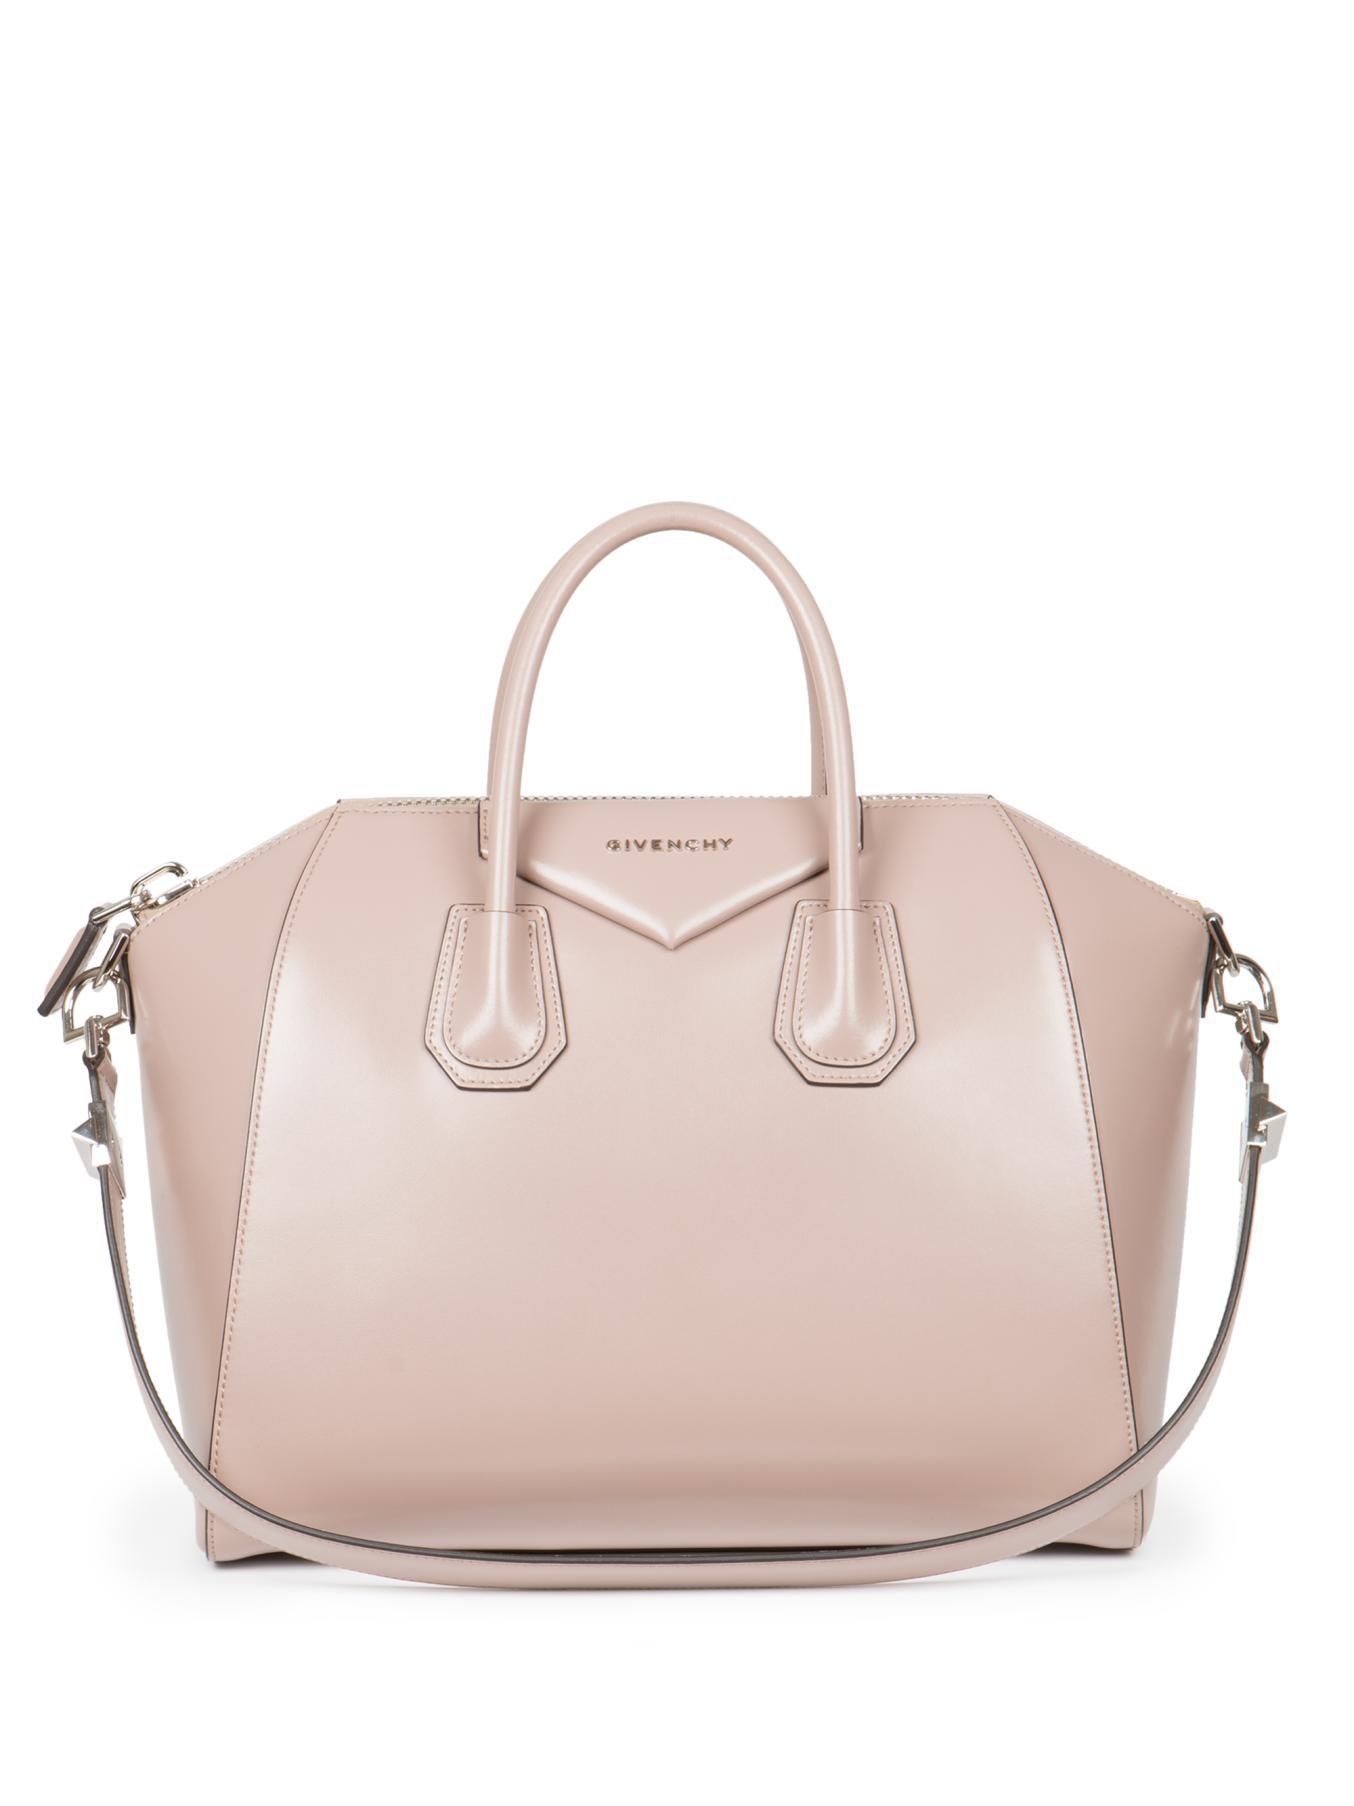 Givenchy Antigona Bag Glazed Leather Small QH30SrqF